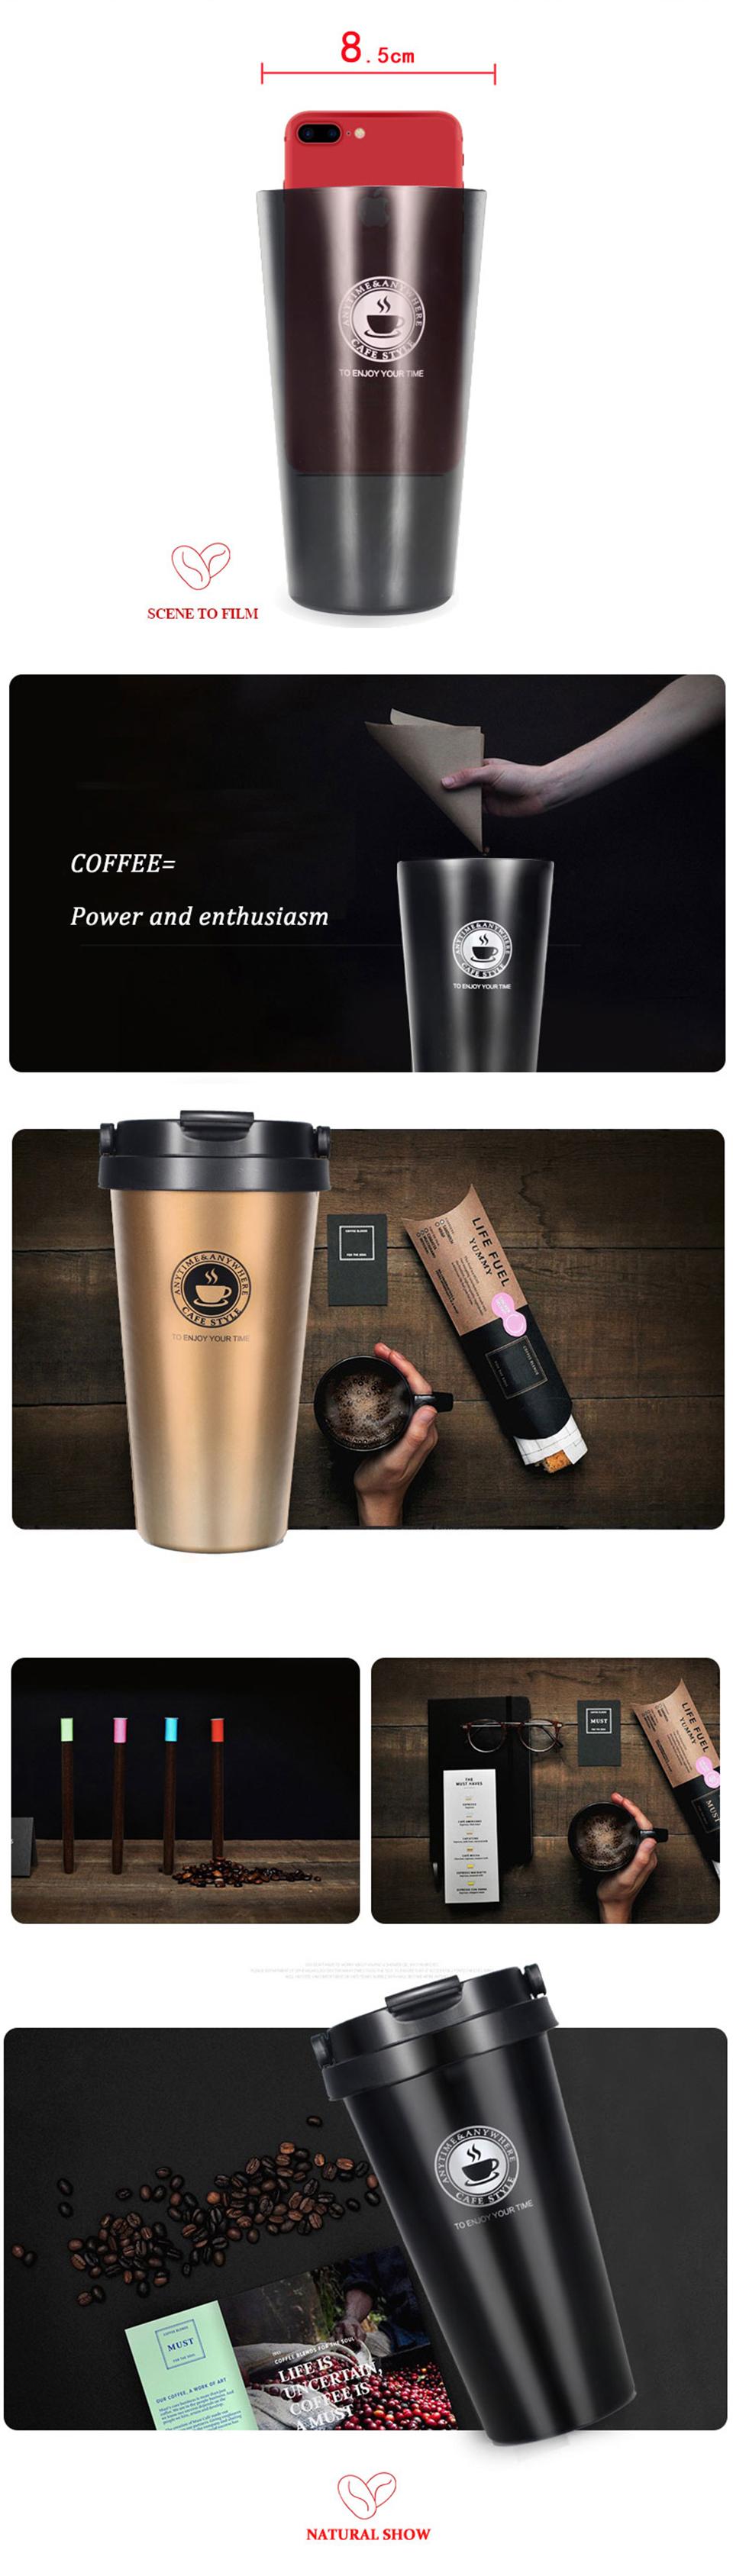 LIYIMENG 500mL Office Travel Coffee Mug 304 Stainless Steel Classical Mug Milk Tea Cup Water Bottle 2